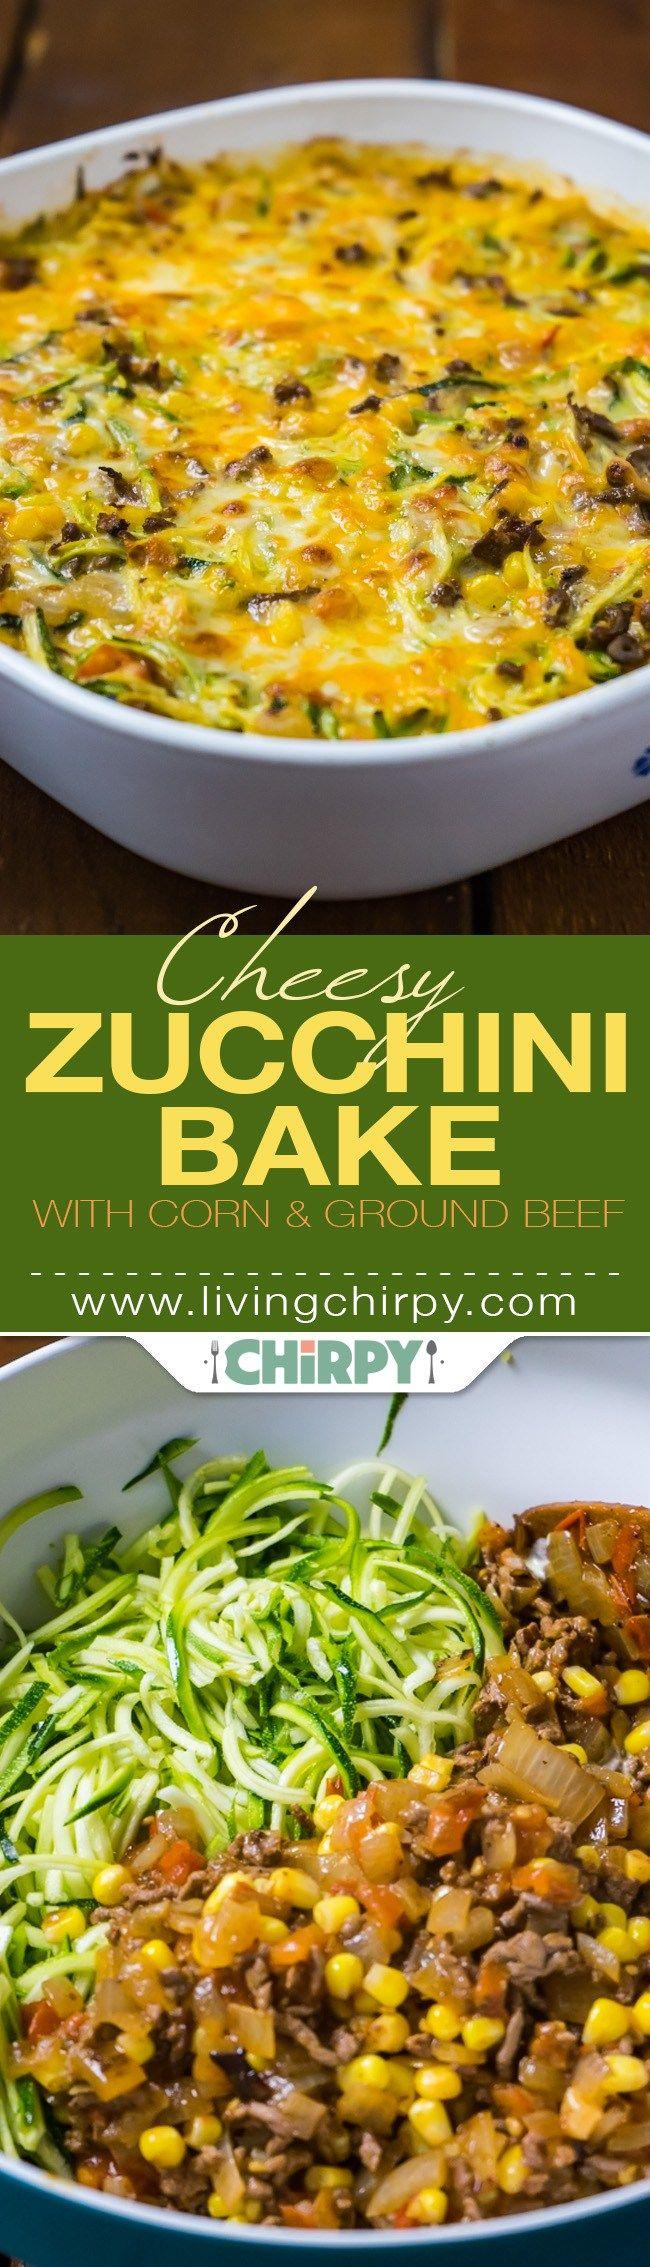 Cheesy Zucchini Bake With Corn and Ground Beef